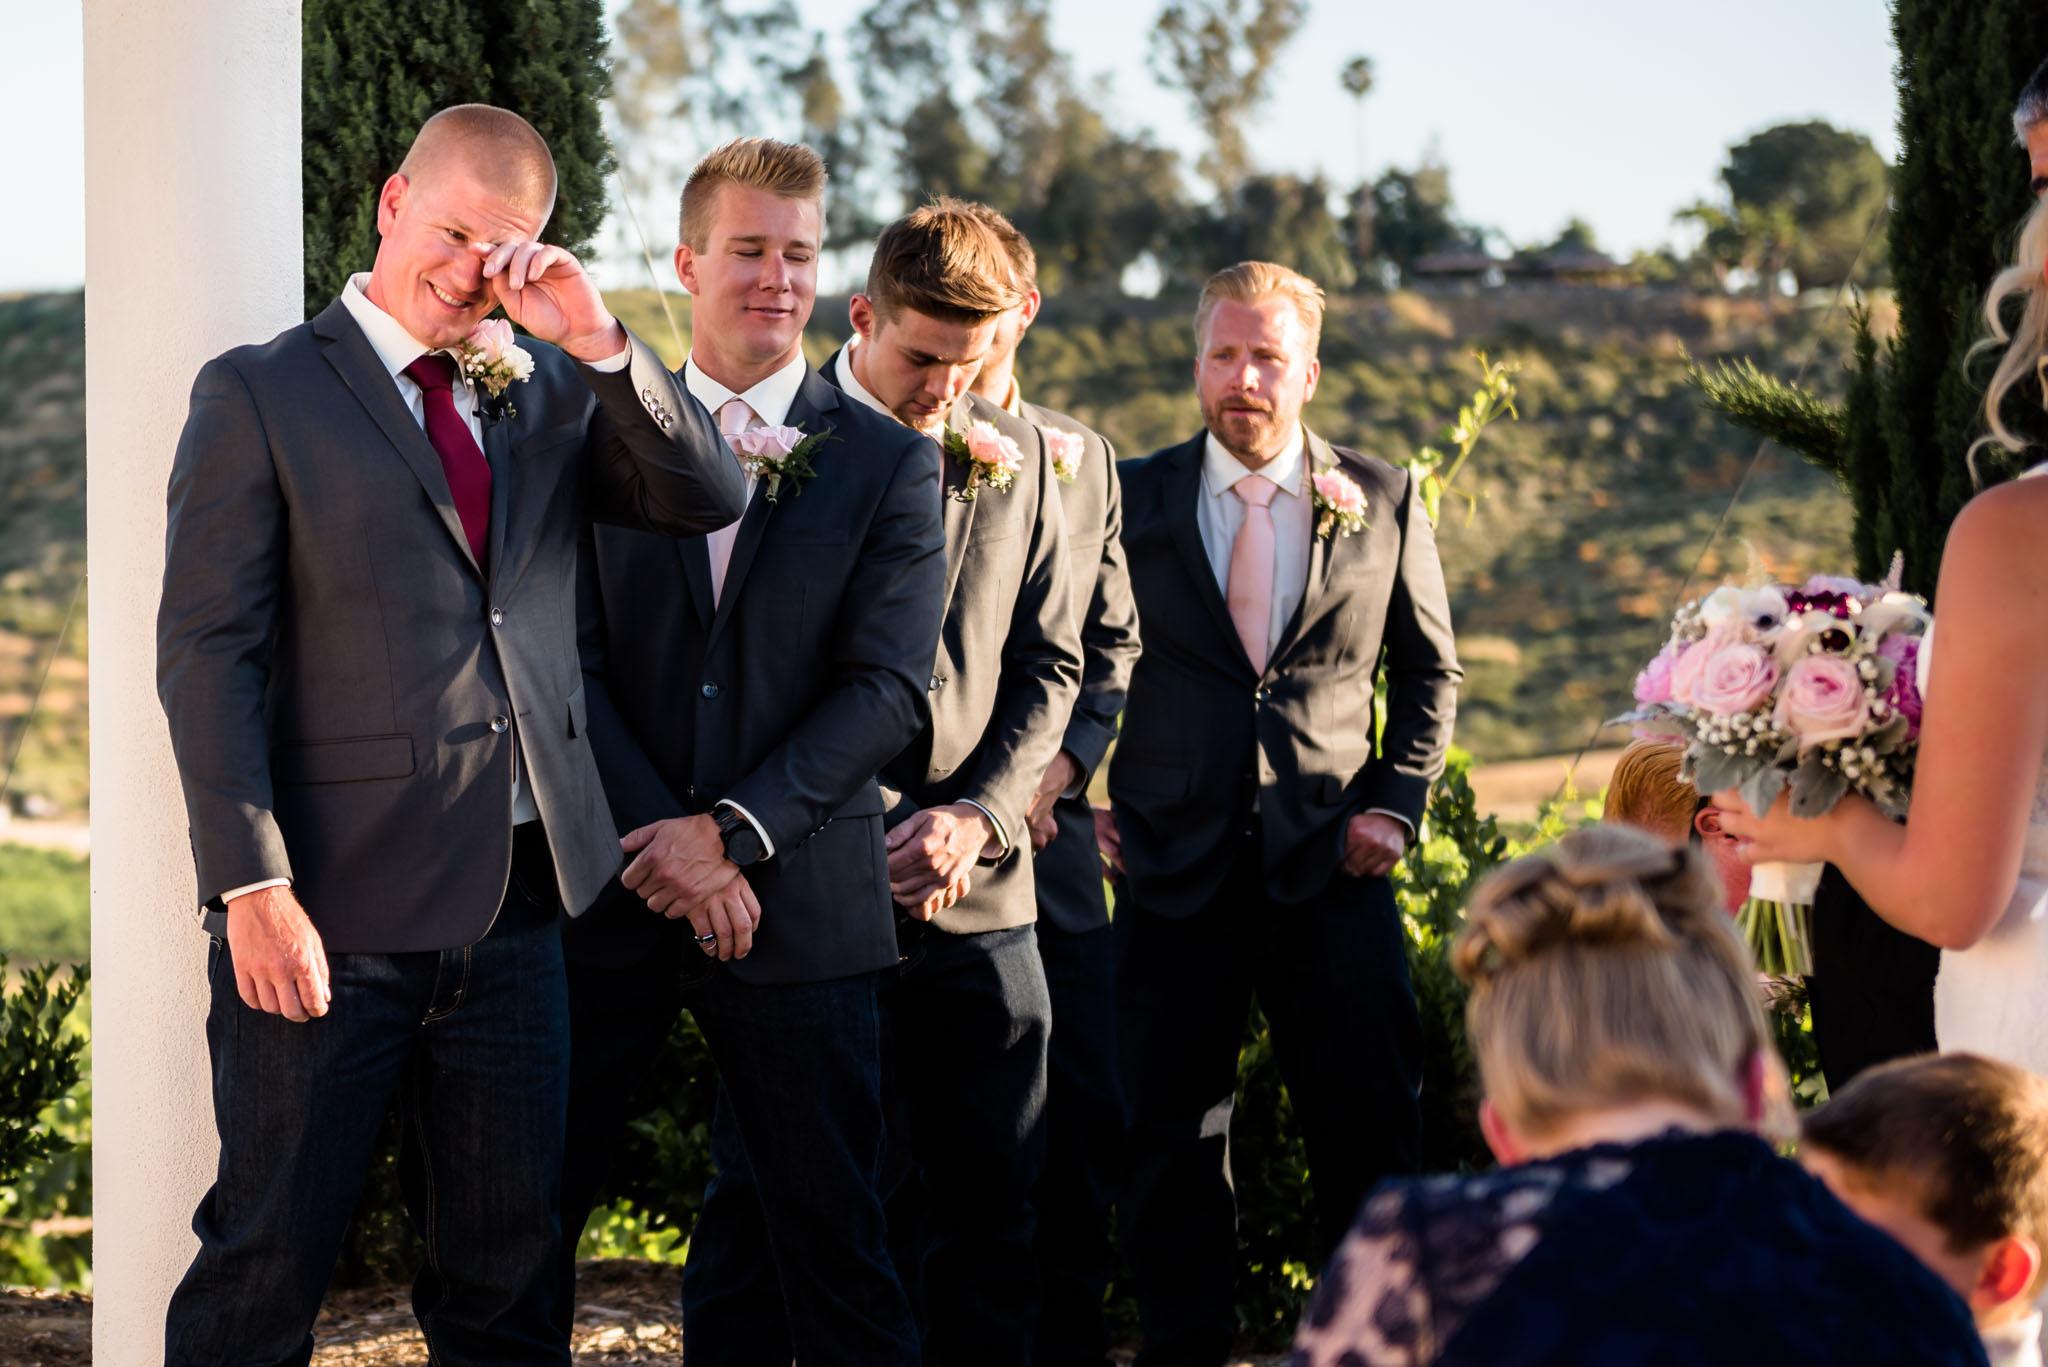 Avensole-Winery-Temecula-Wedding-Josh-and-Olivia-3495.JPG